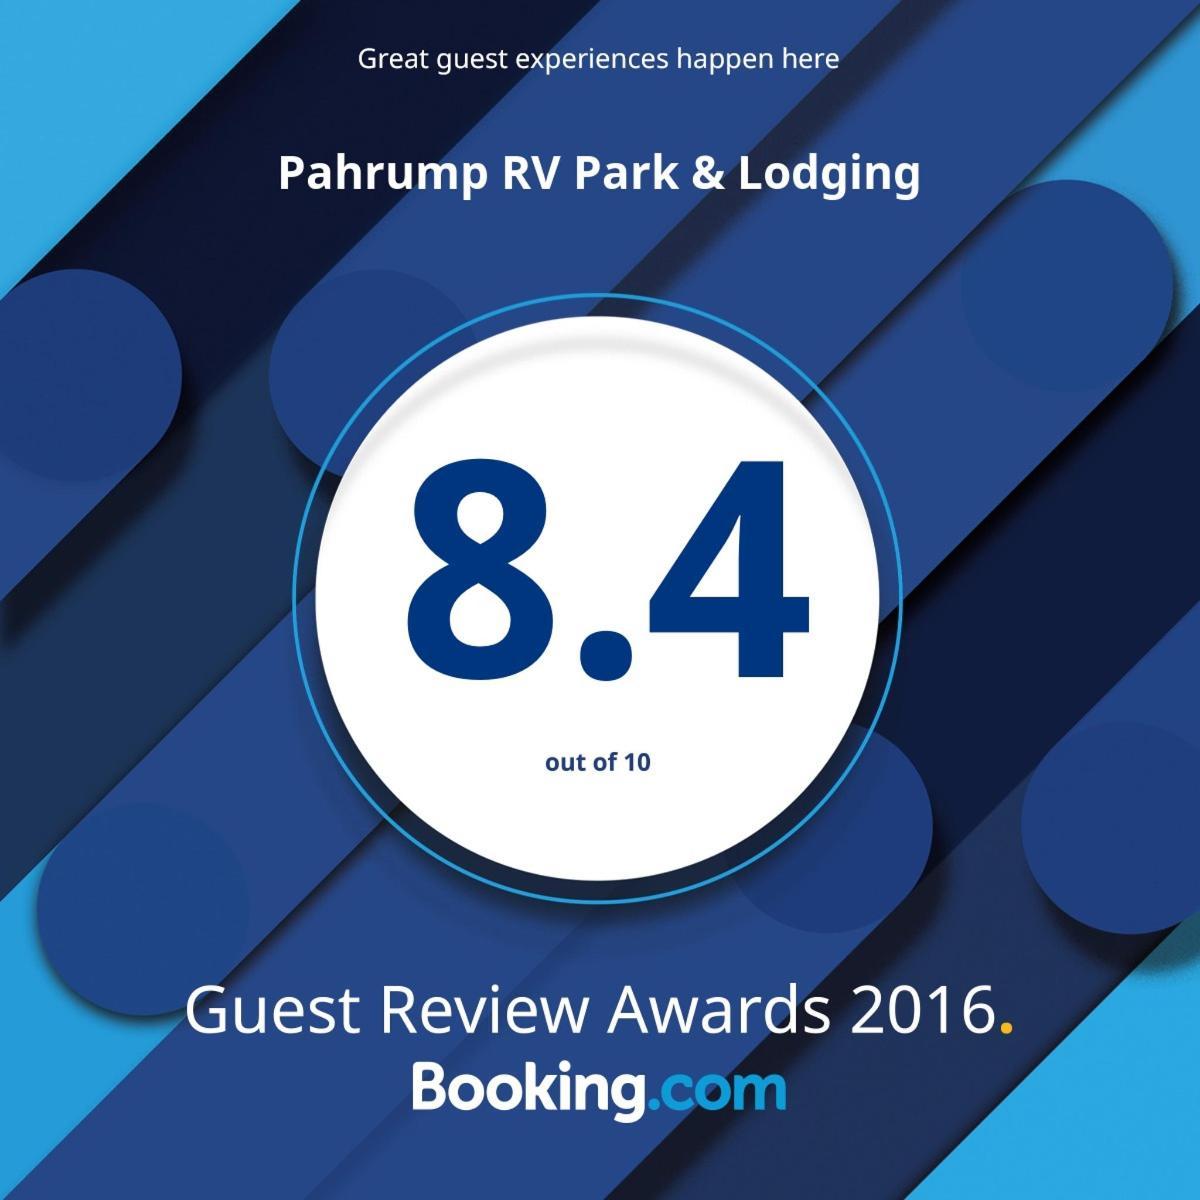 Pahrump RV Park - Pahrump, Nevada's only Full-Service RV Park